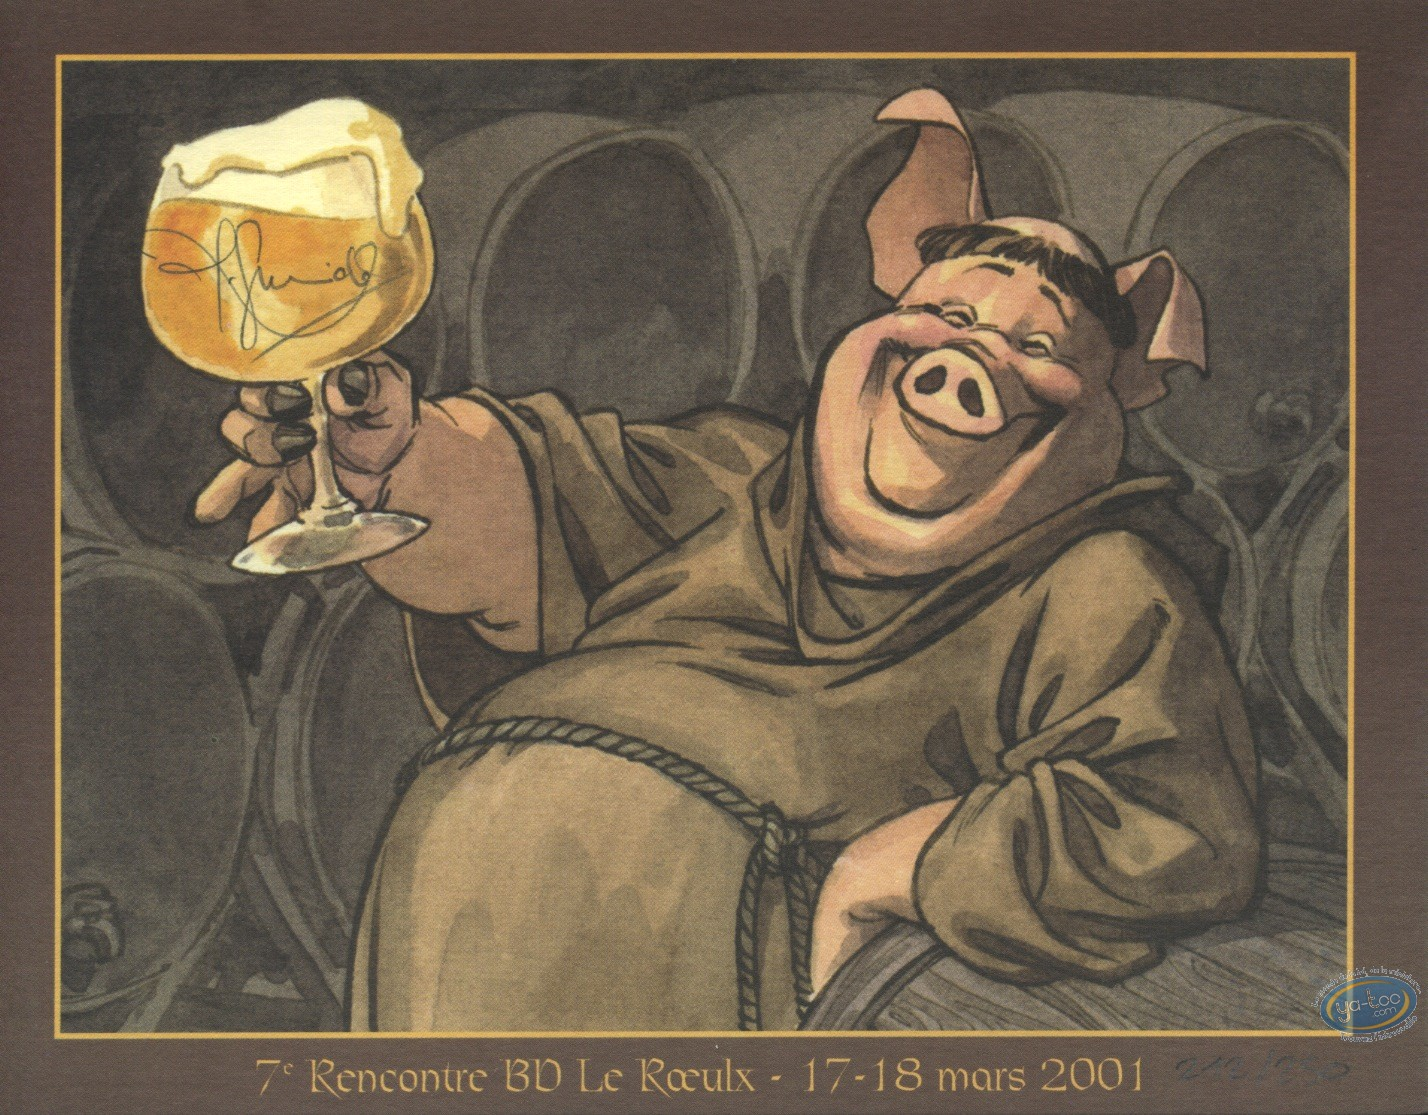 Bookplate Offset, Monks & beer